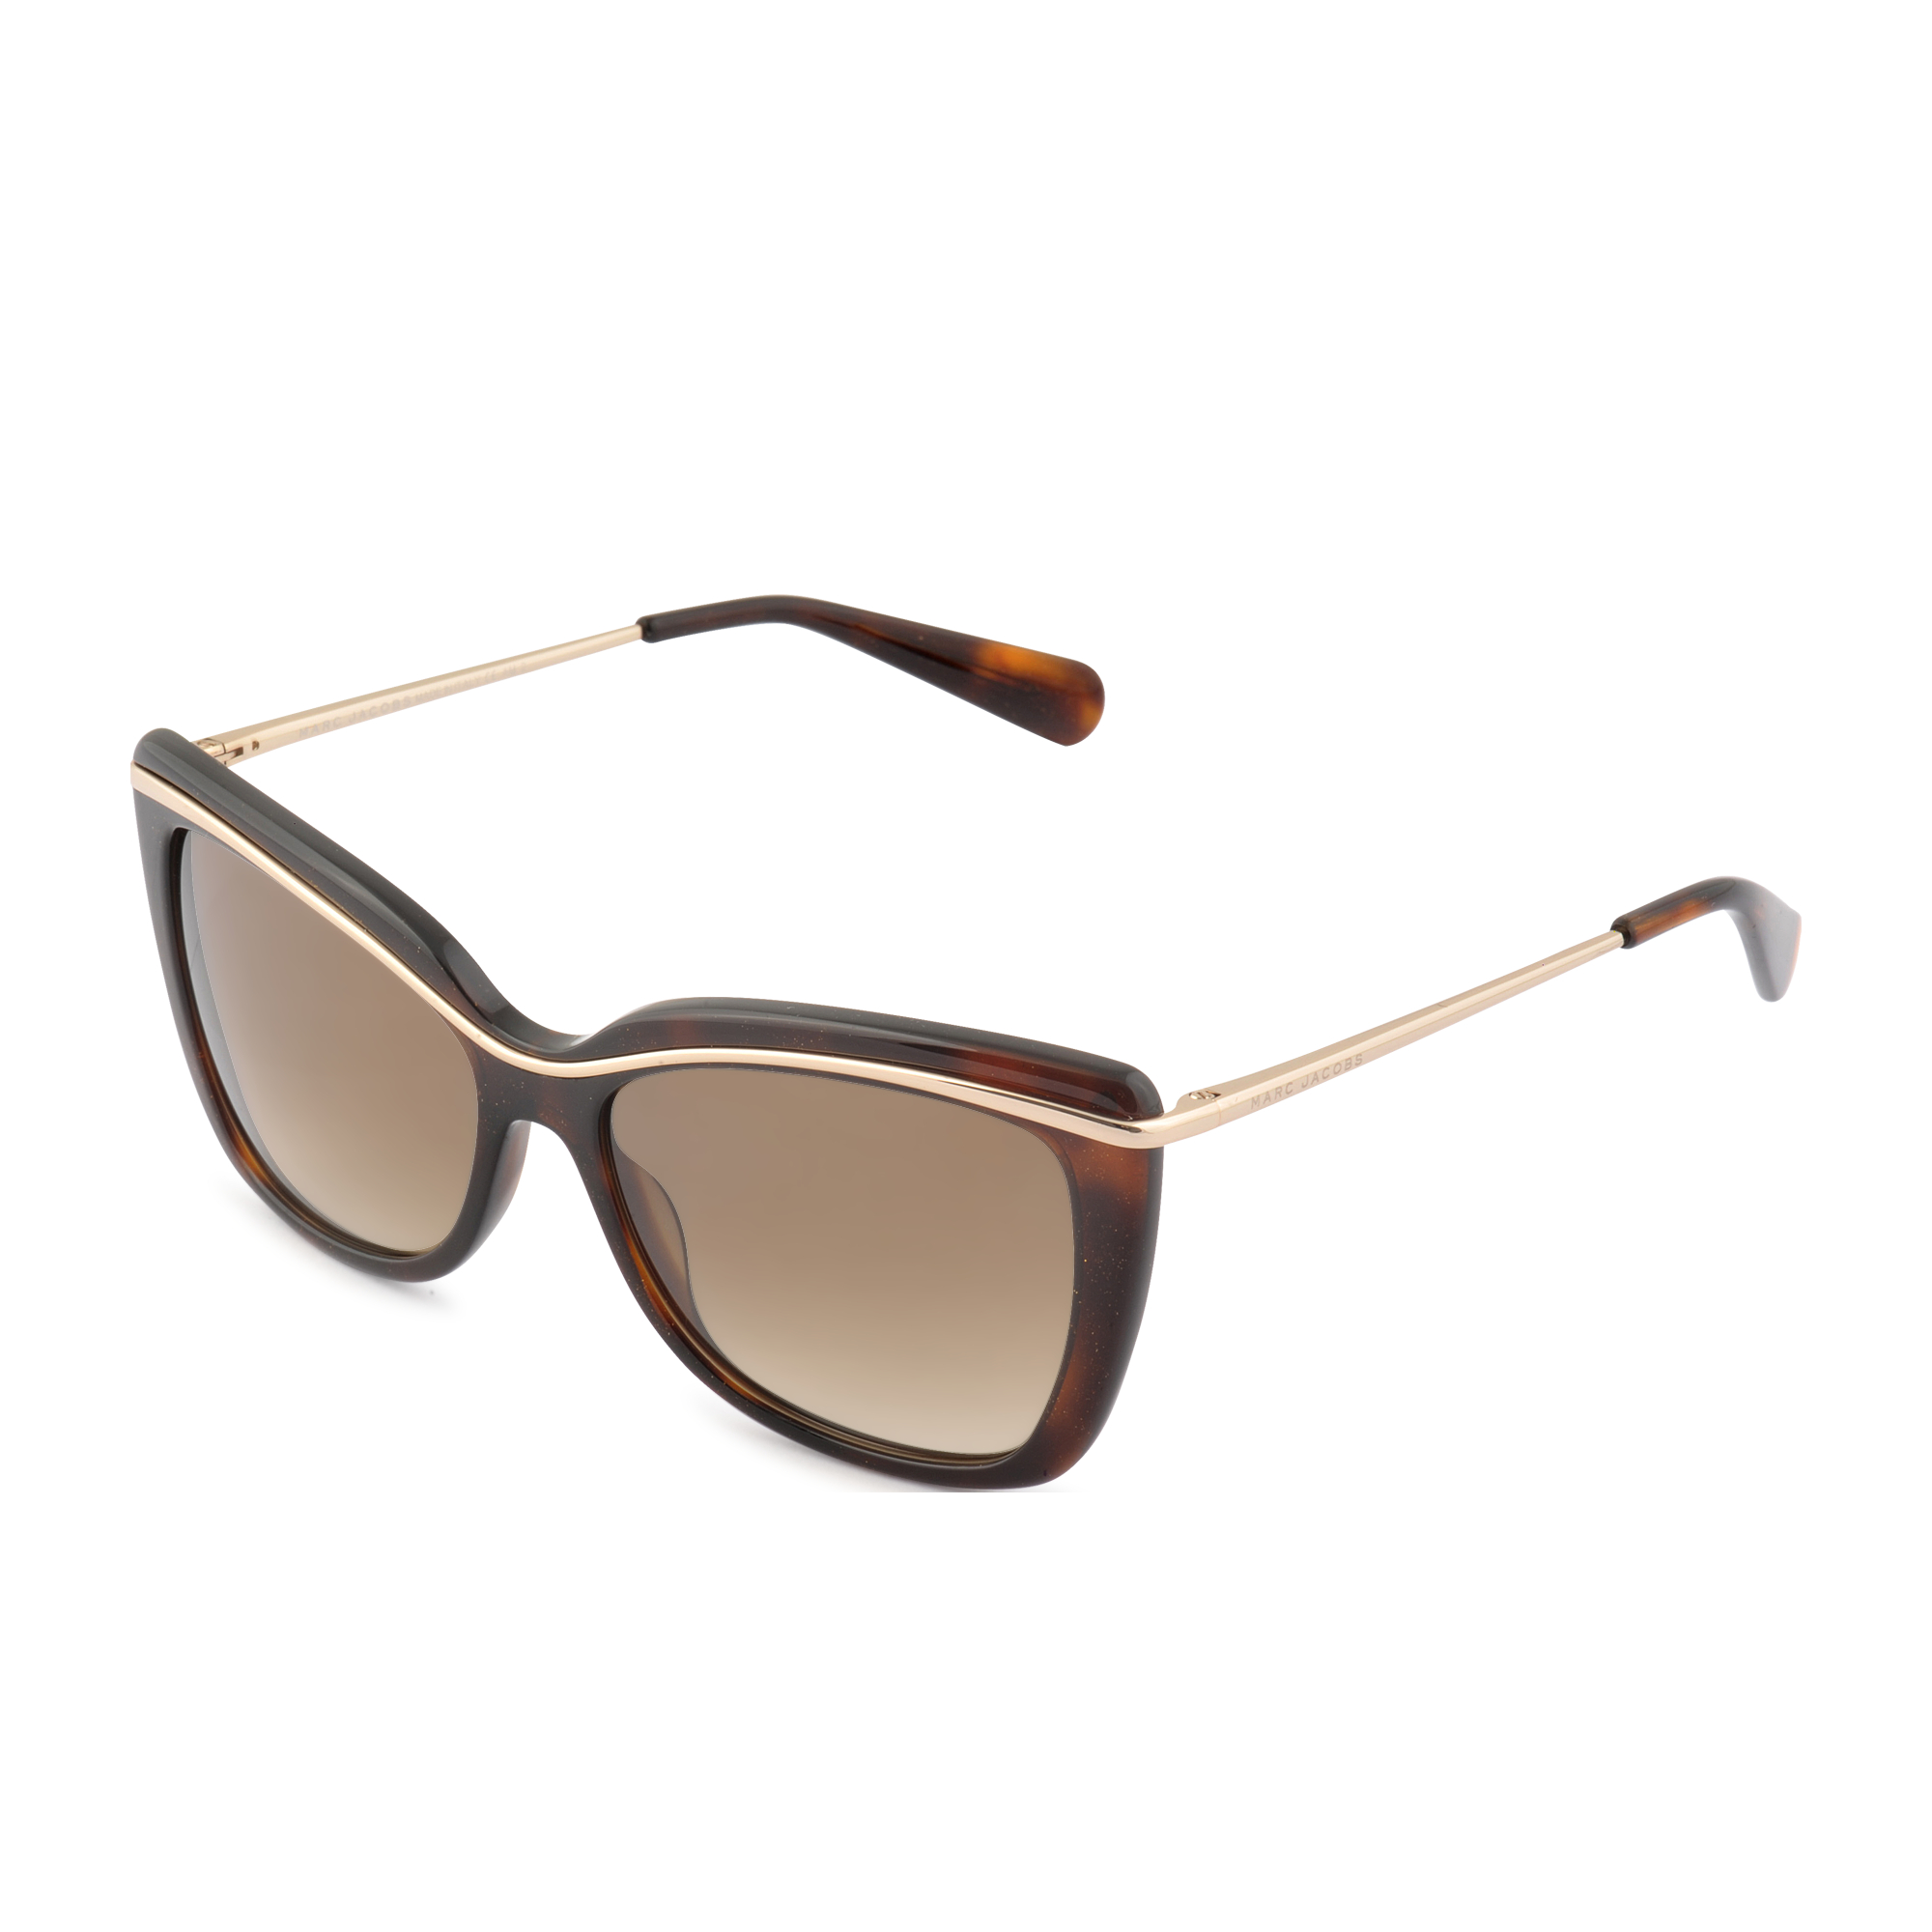 marc mj 534 s sunglasses in brown lyst